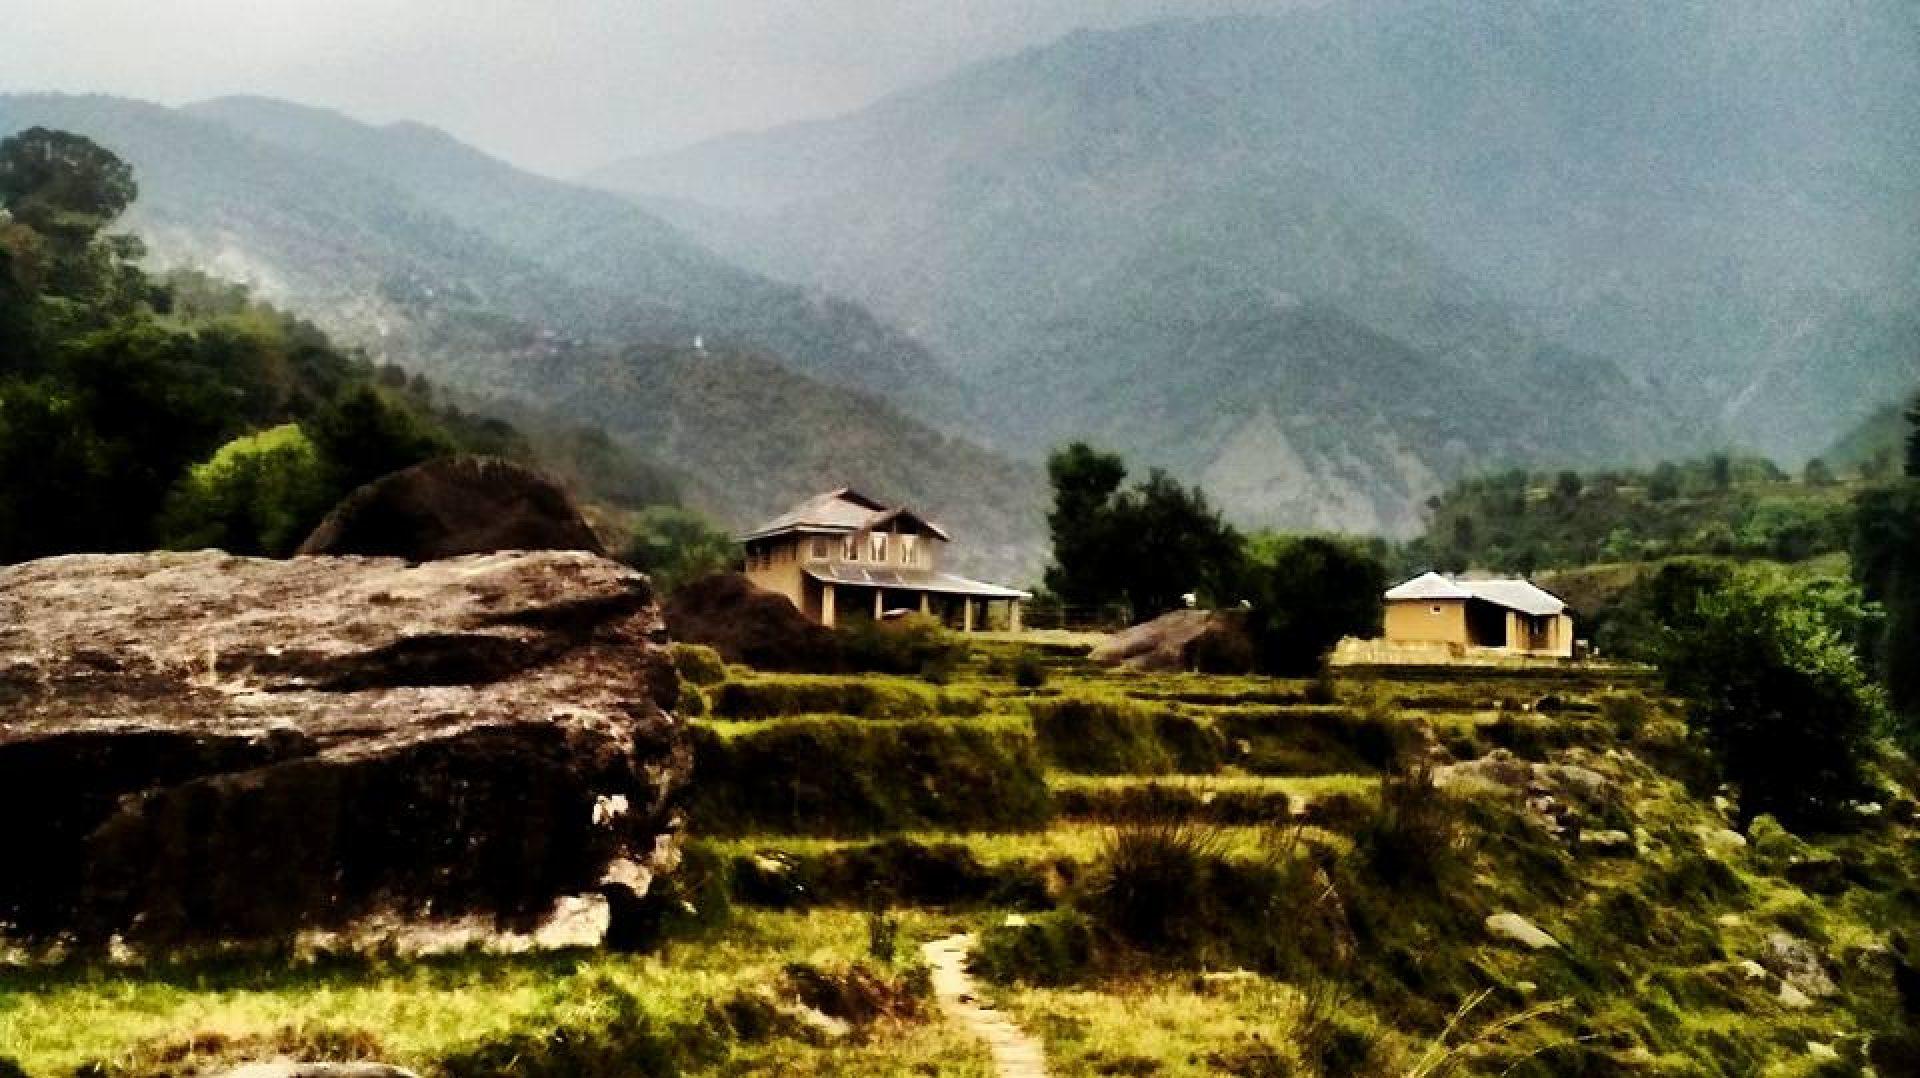 The Earth House, Chandpur Village, Palampur, Himachal Pradesh